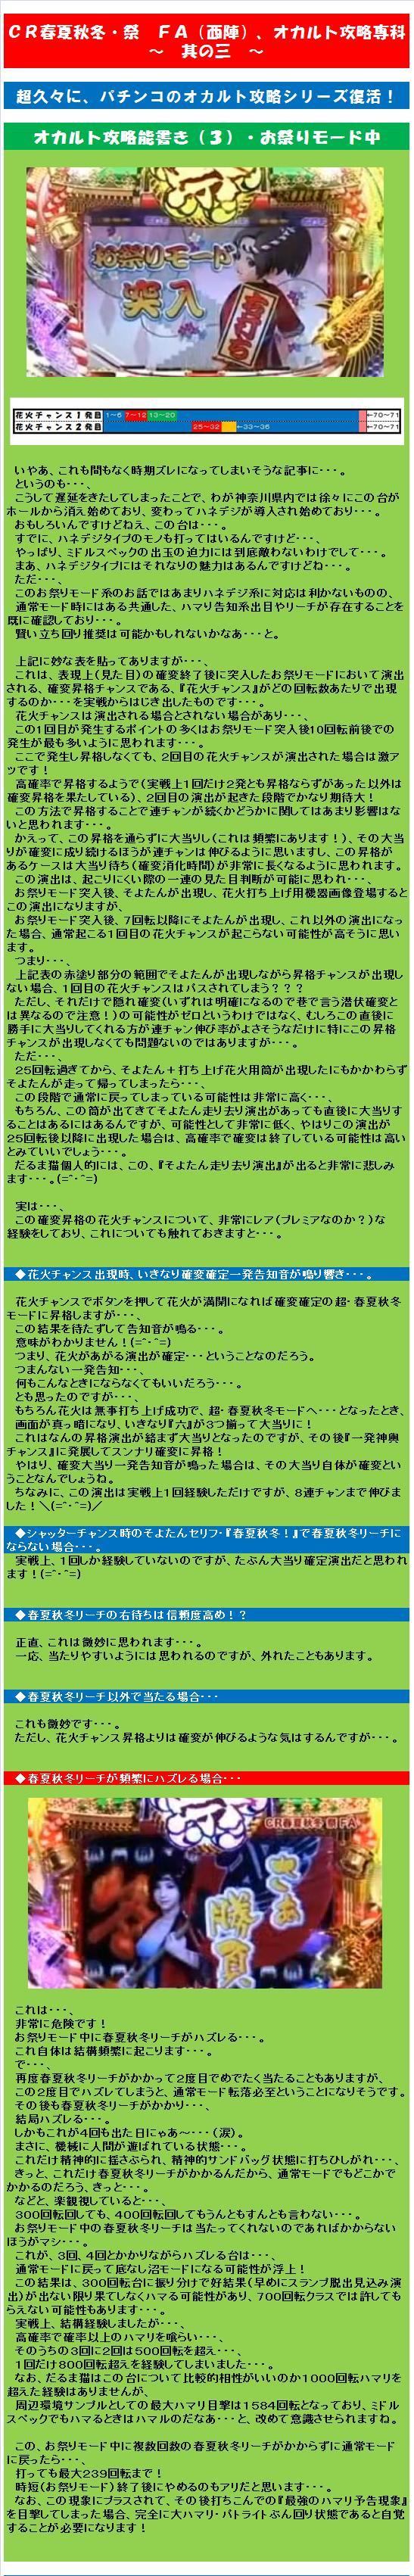 20111126・CR春夏秋冬・祭オカルト攻略(3)①.jpg